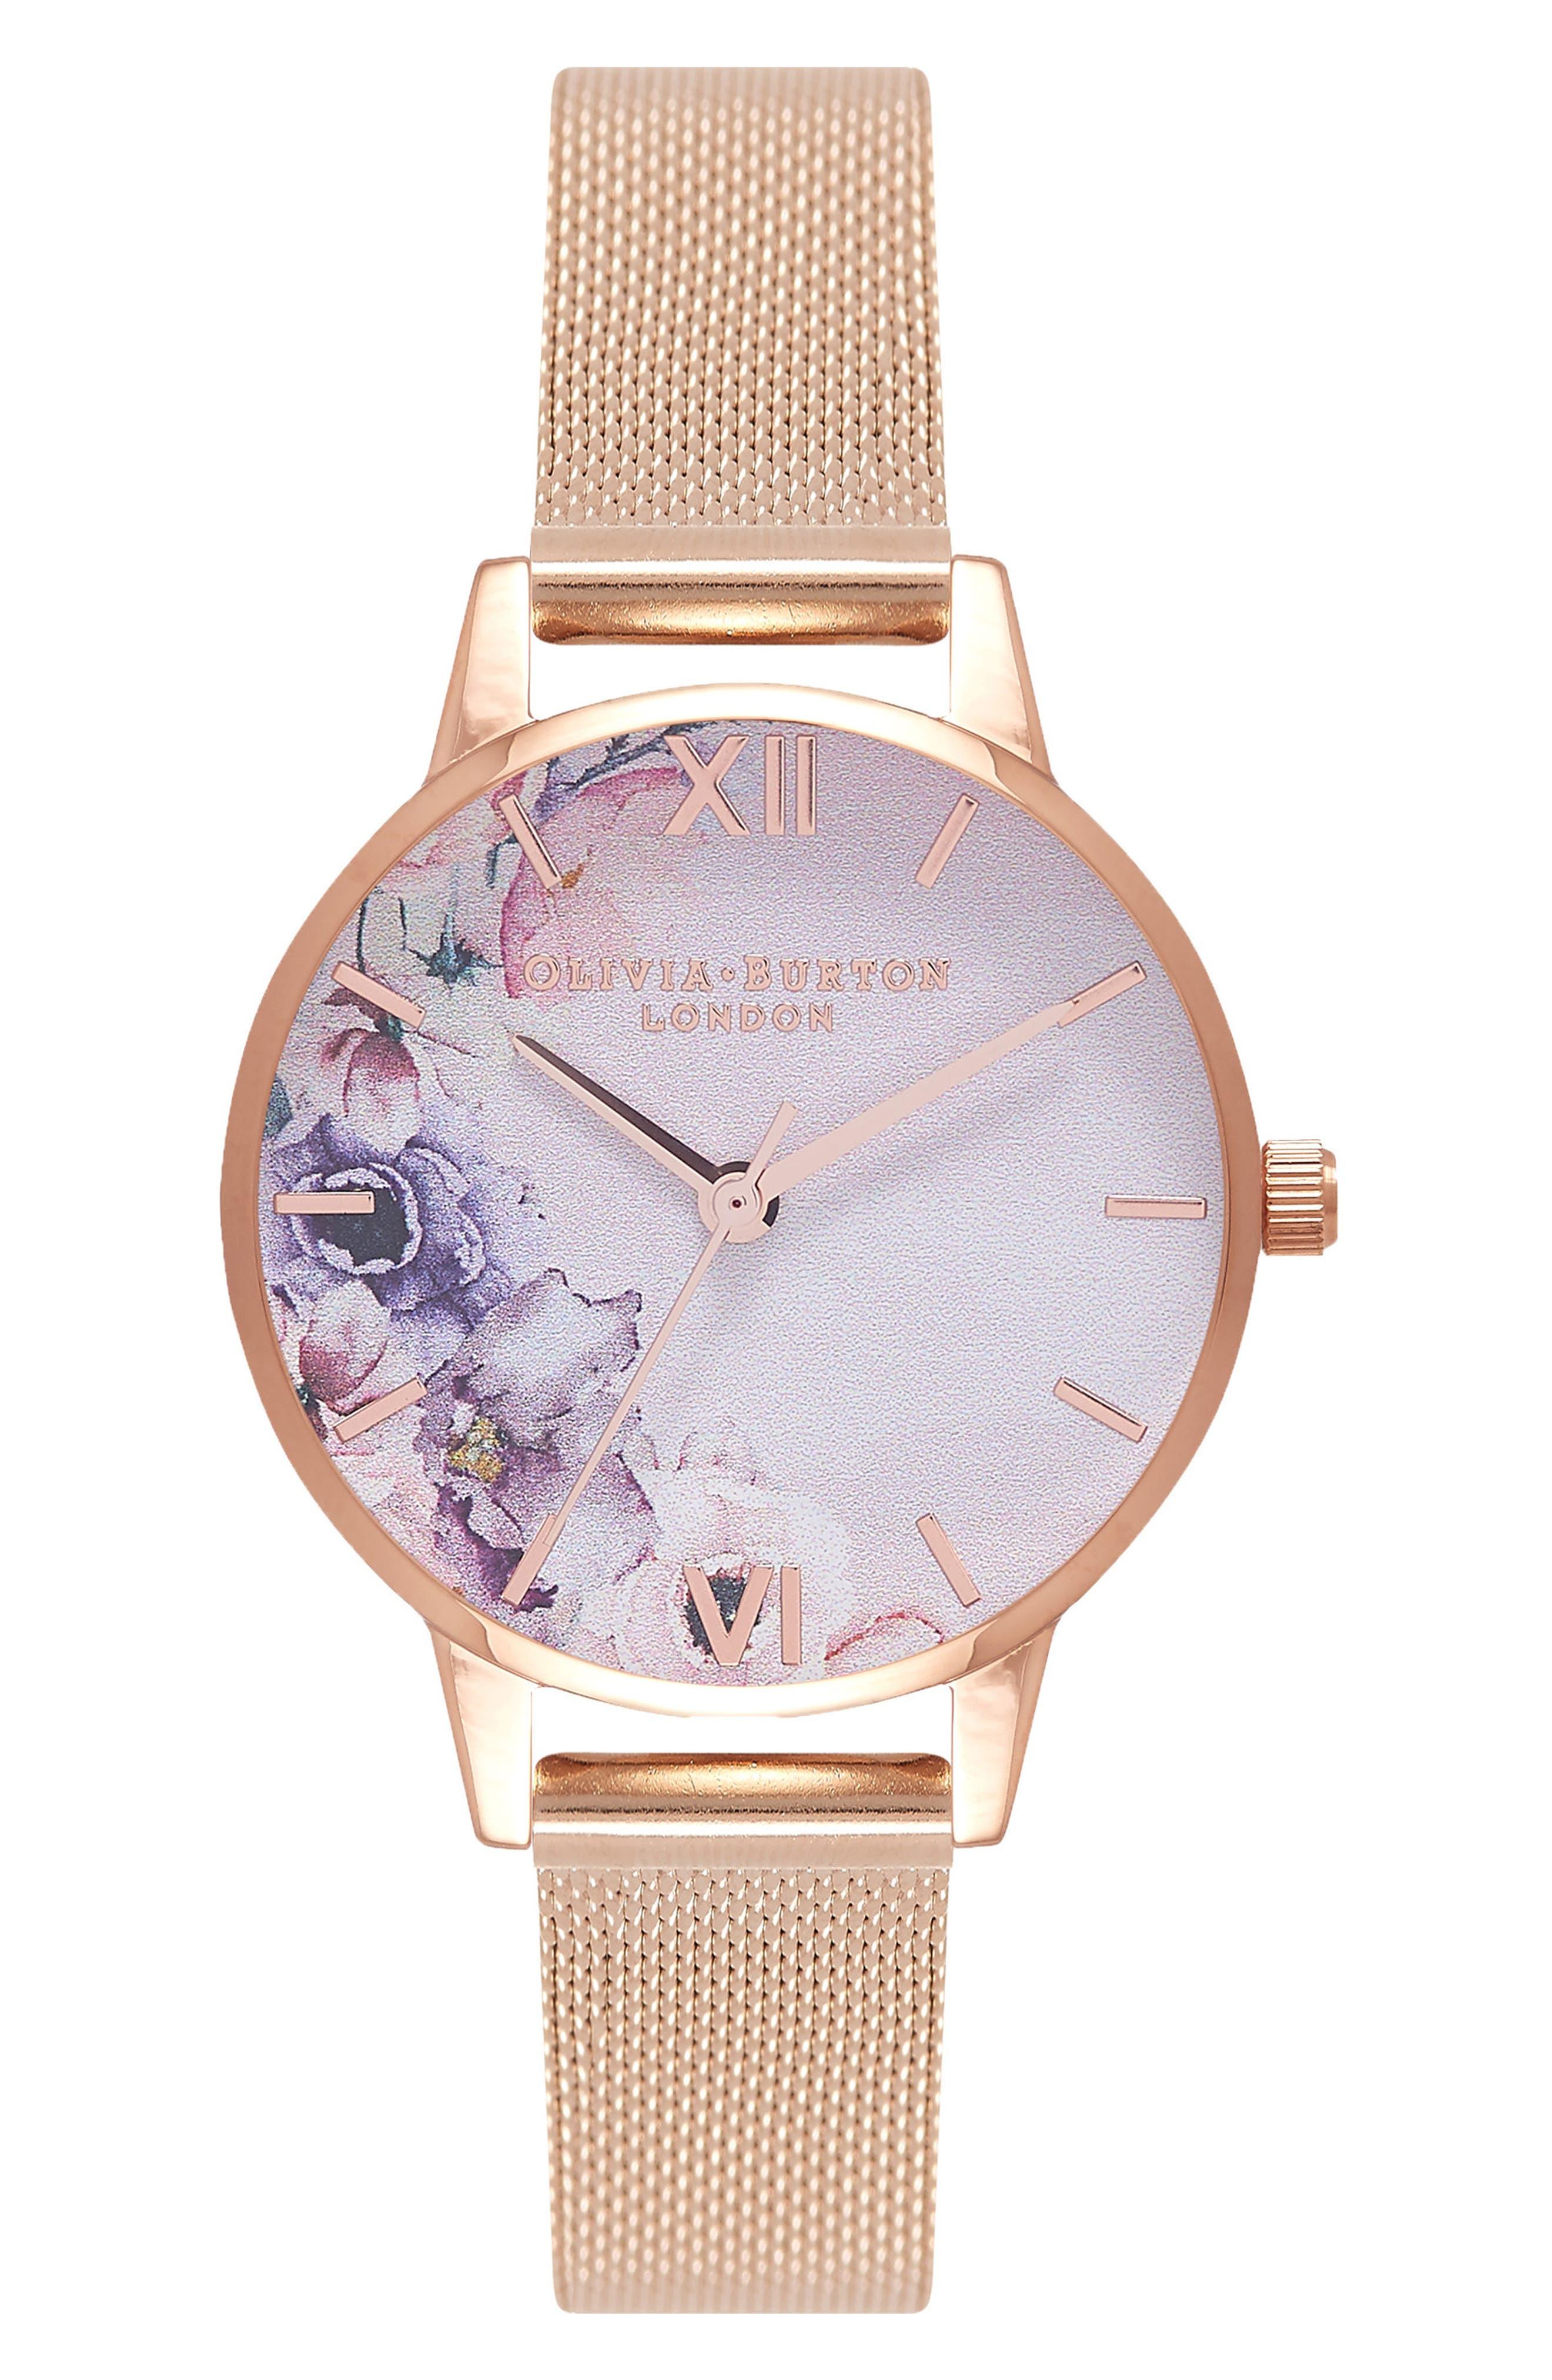 OLIVIA BURTON, Watercolour Florals Mesh Strap Watch, 30mm, Main thumbnail 1, color, ROSE GOLD/ WHITE / ROSE GOLD